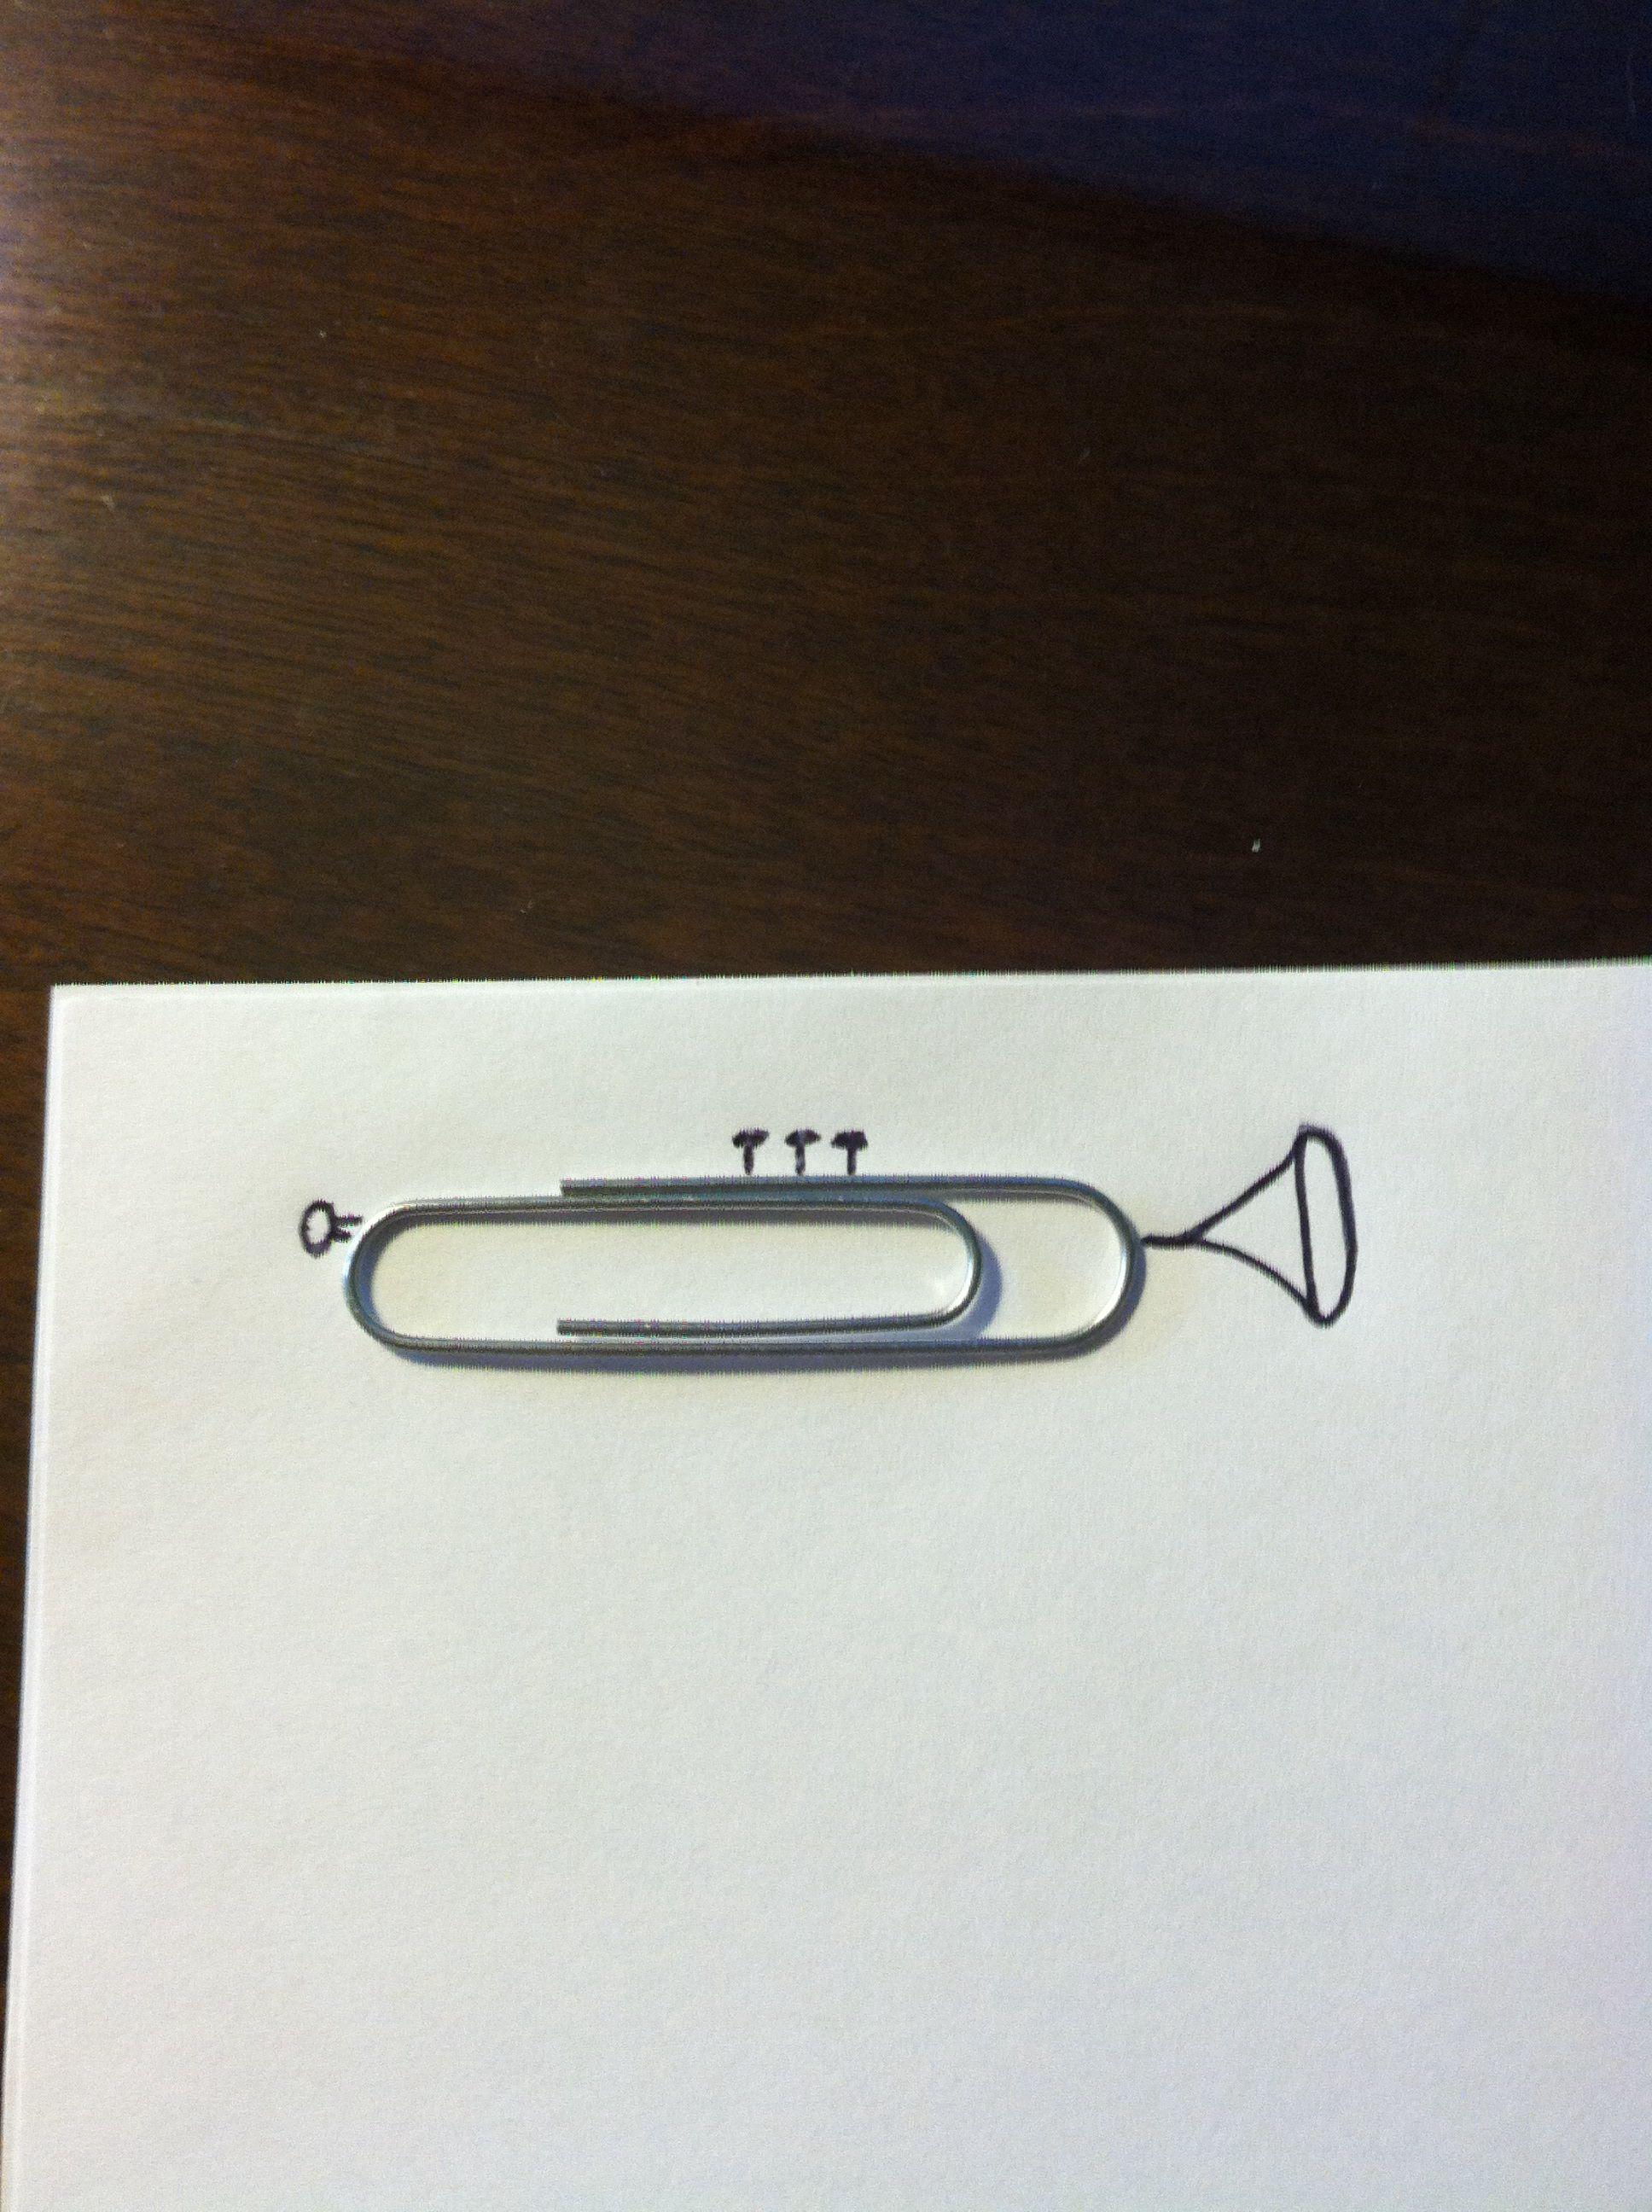 Trumpet Life Drum Corps International Drum Corps Trumpet